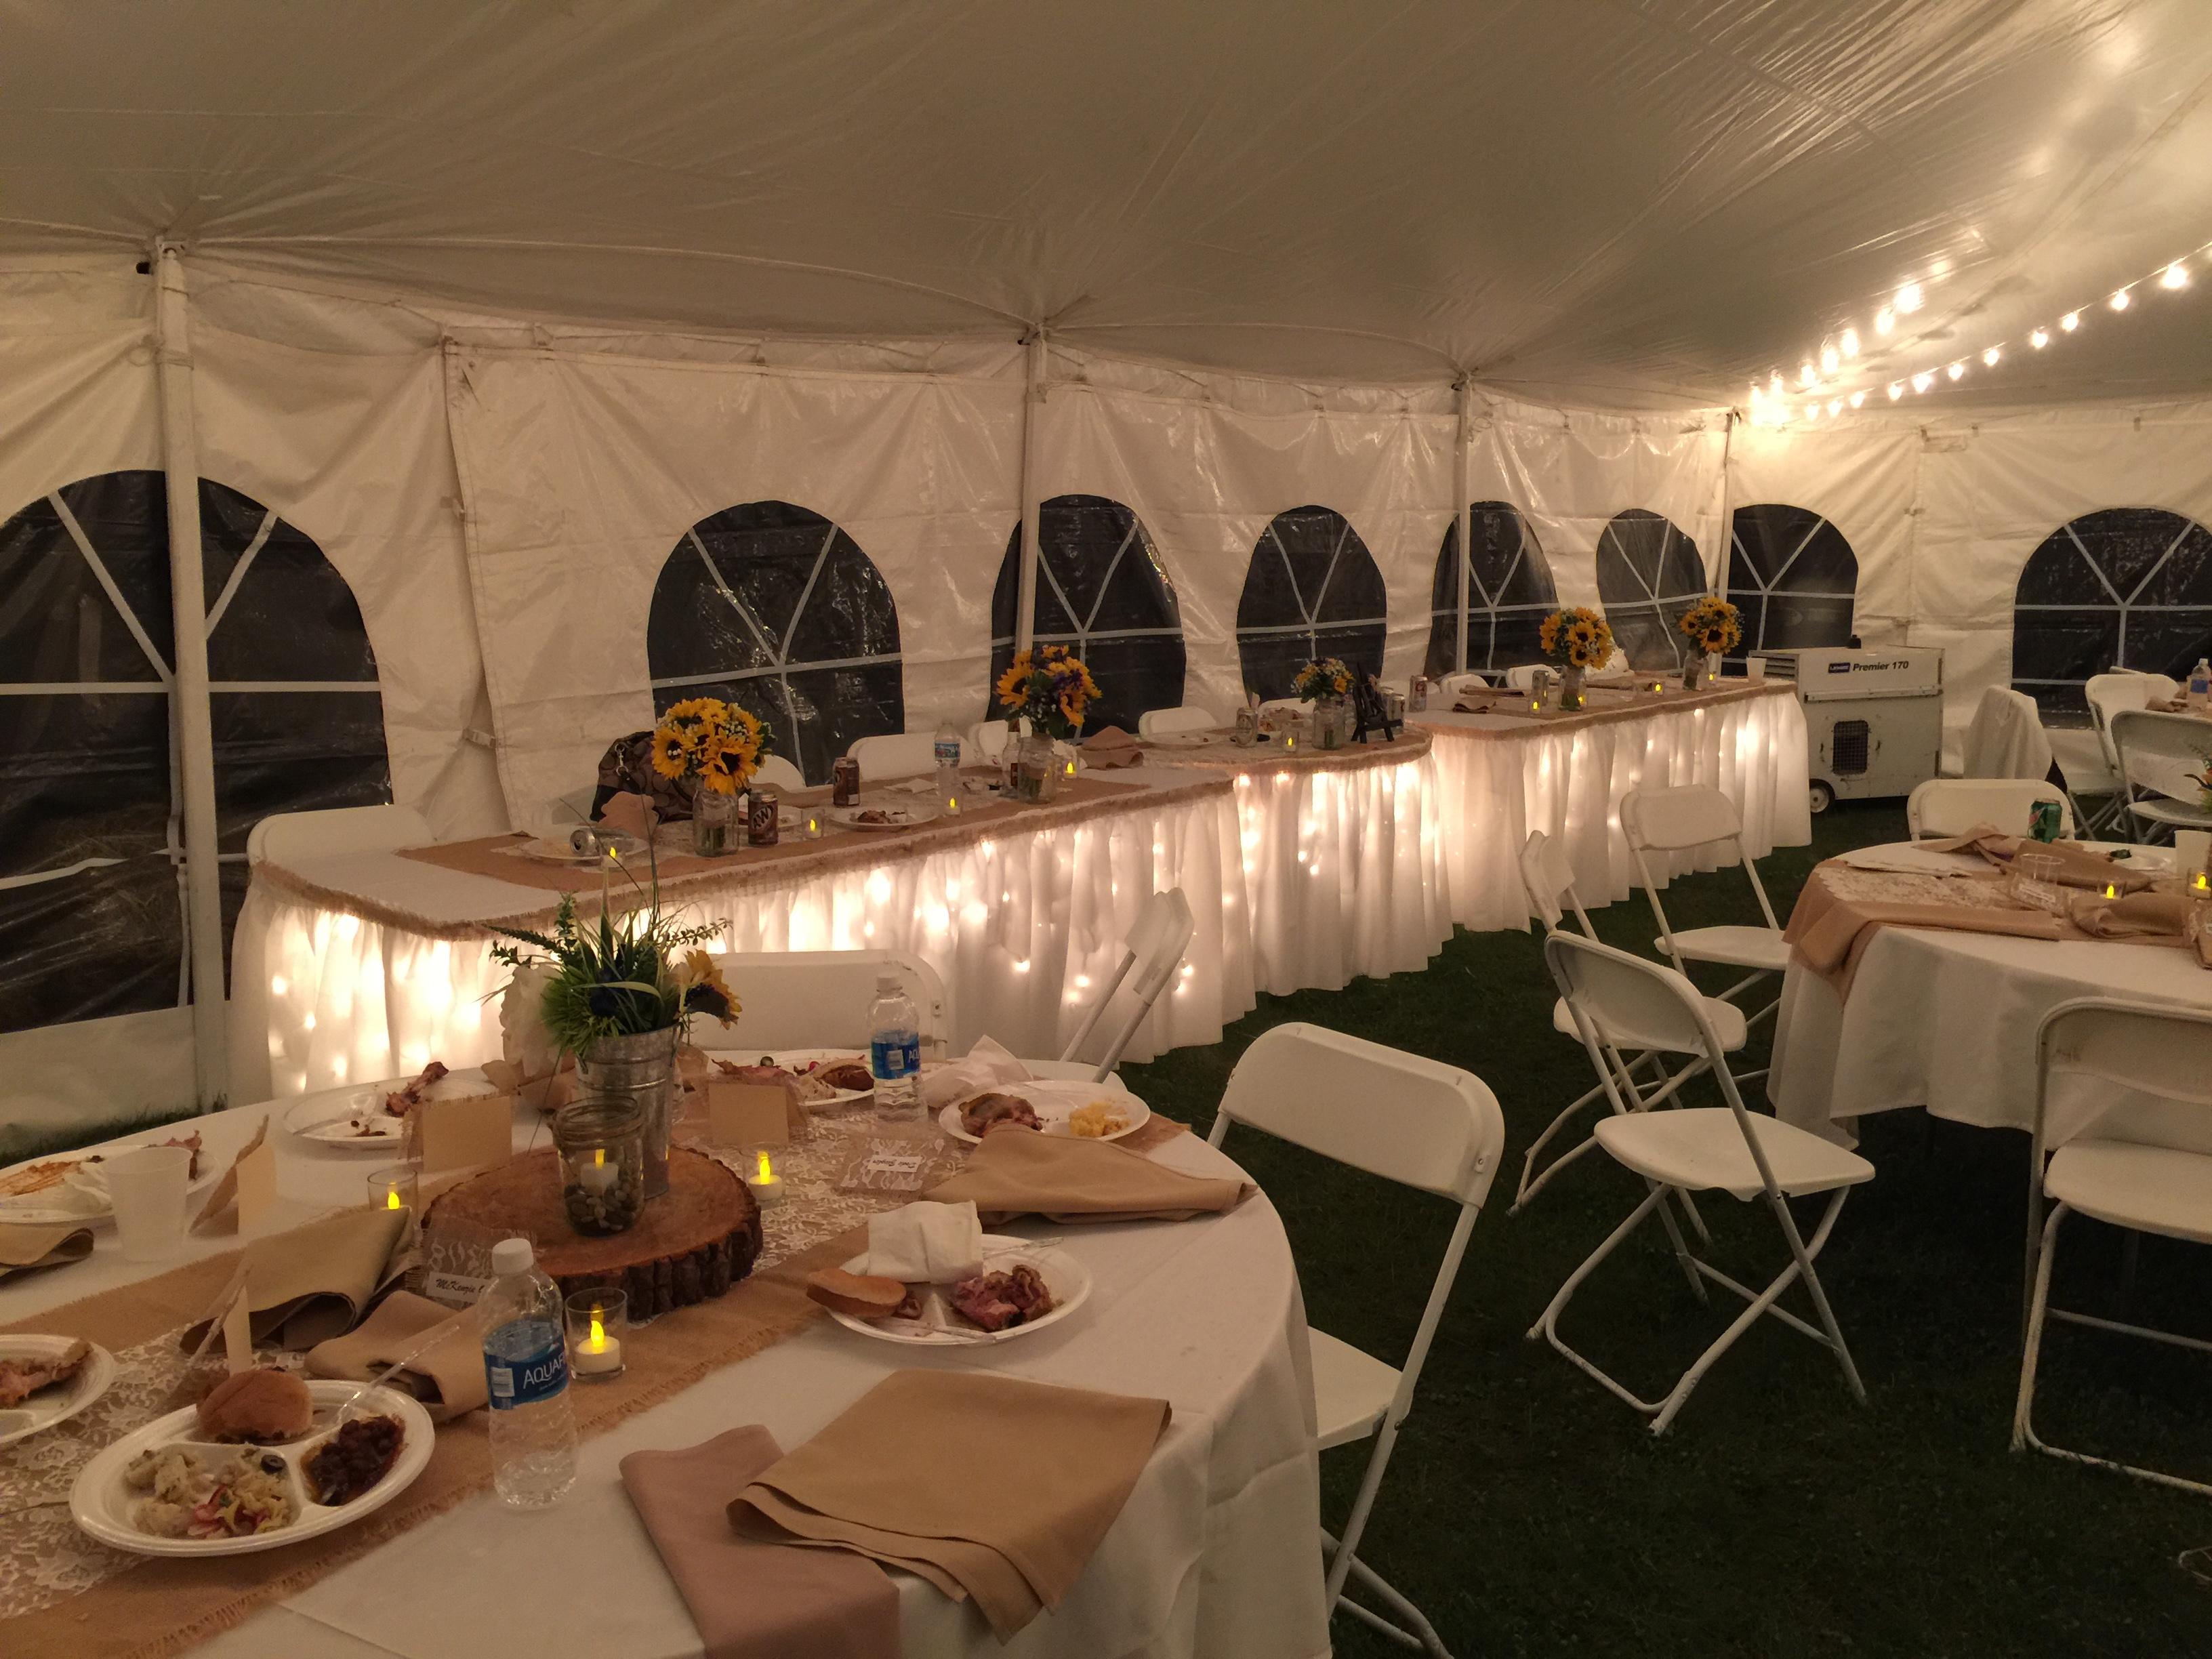 Spring Ranch Wedding - Rent Today! - G & K Event Rentals